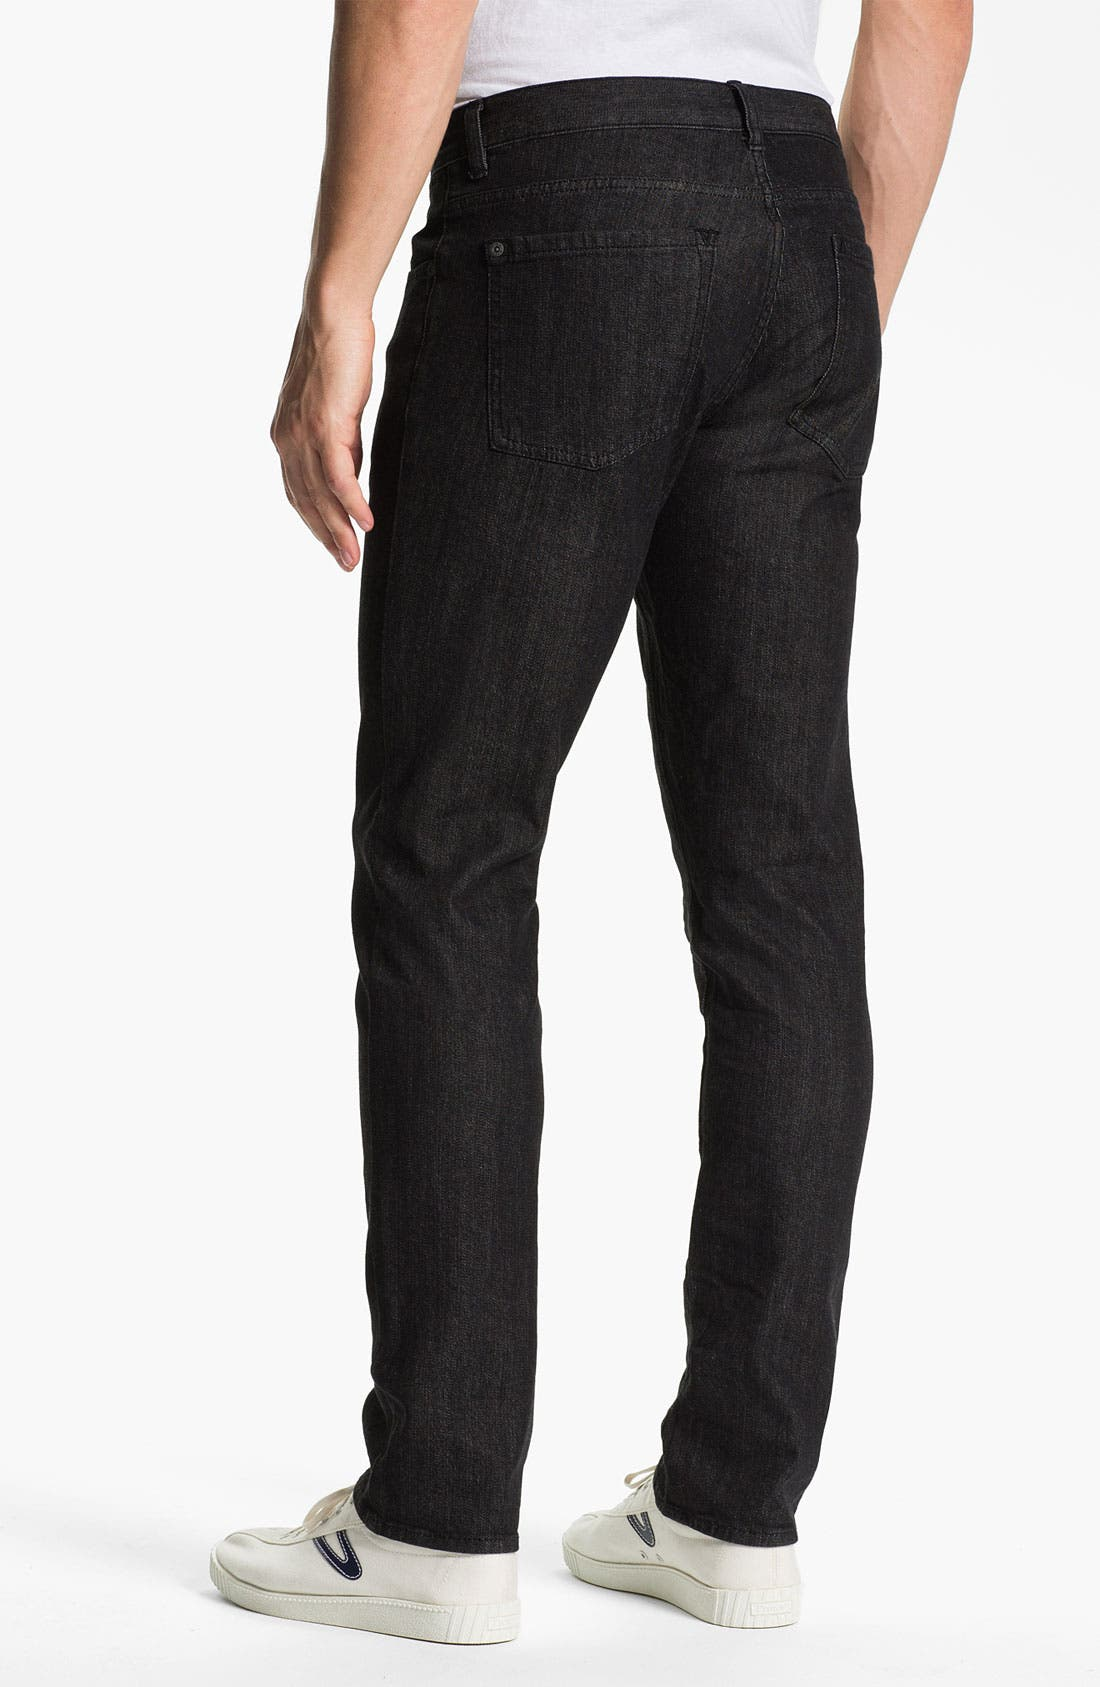 Alternate Image 1 Selected - RVCA 'Daggers' Slim Leg Jeans (Black)